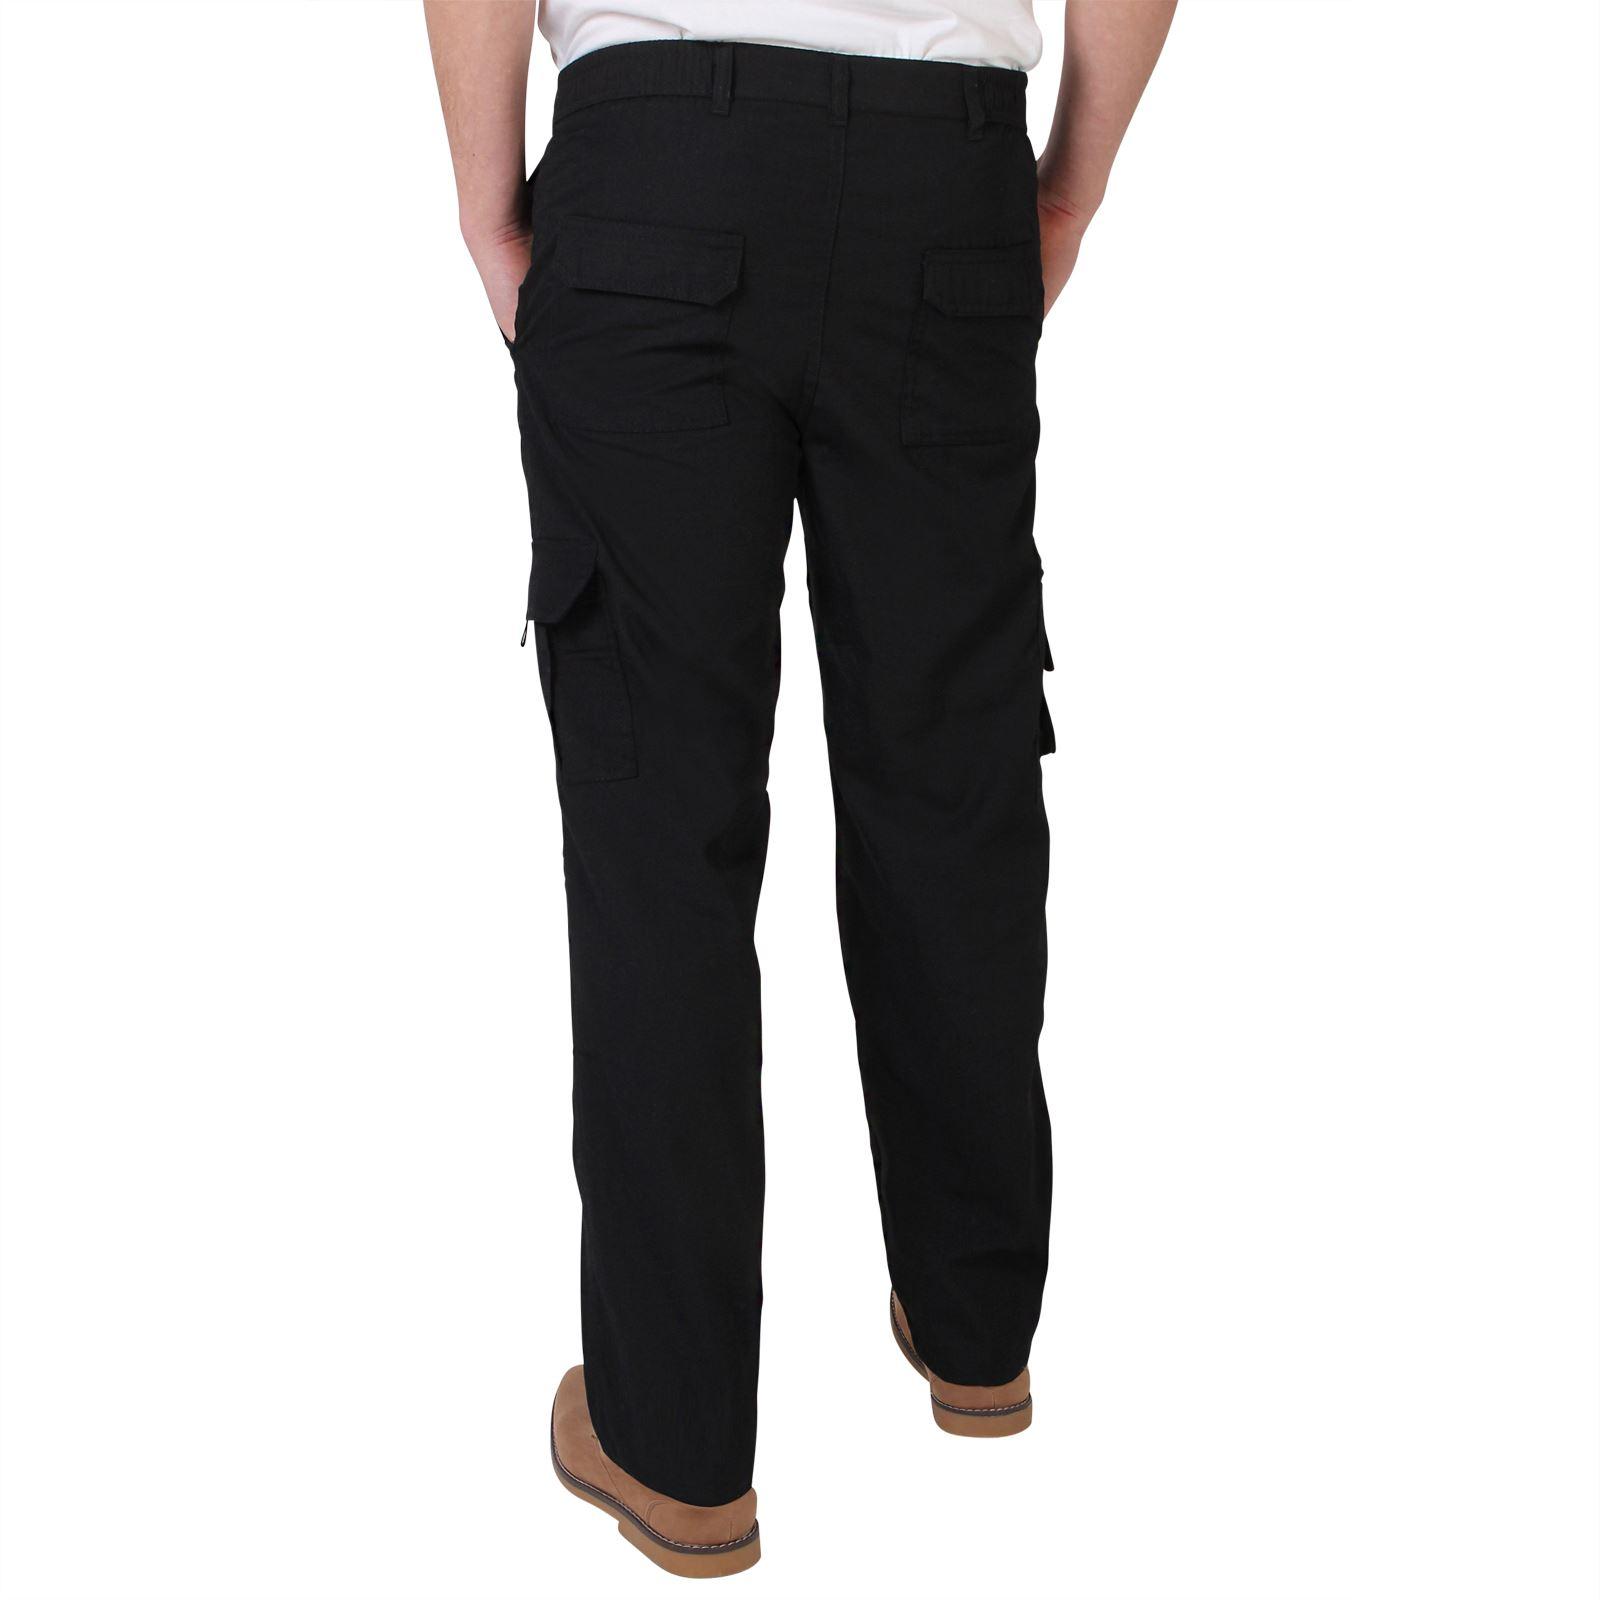 Pantalones-Hombre-Estilo-Cargo-Militar-Combate-Multibolsillos-Casual miniatura 28